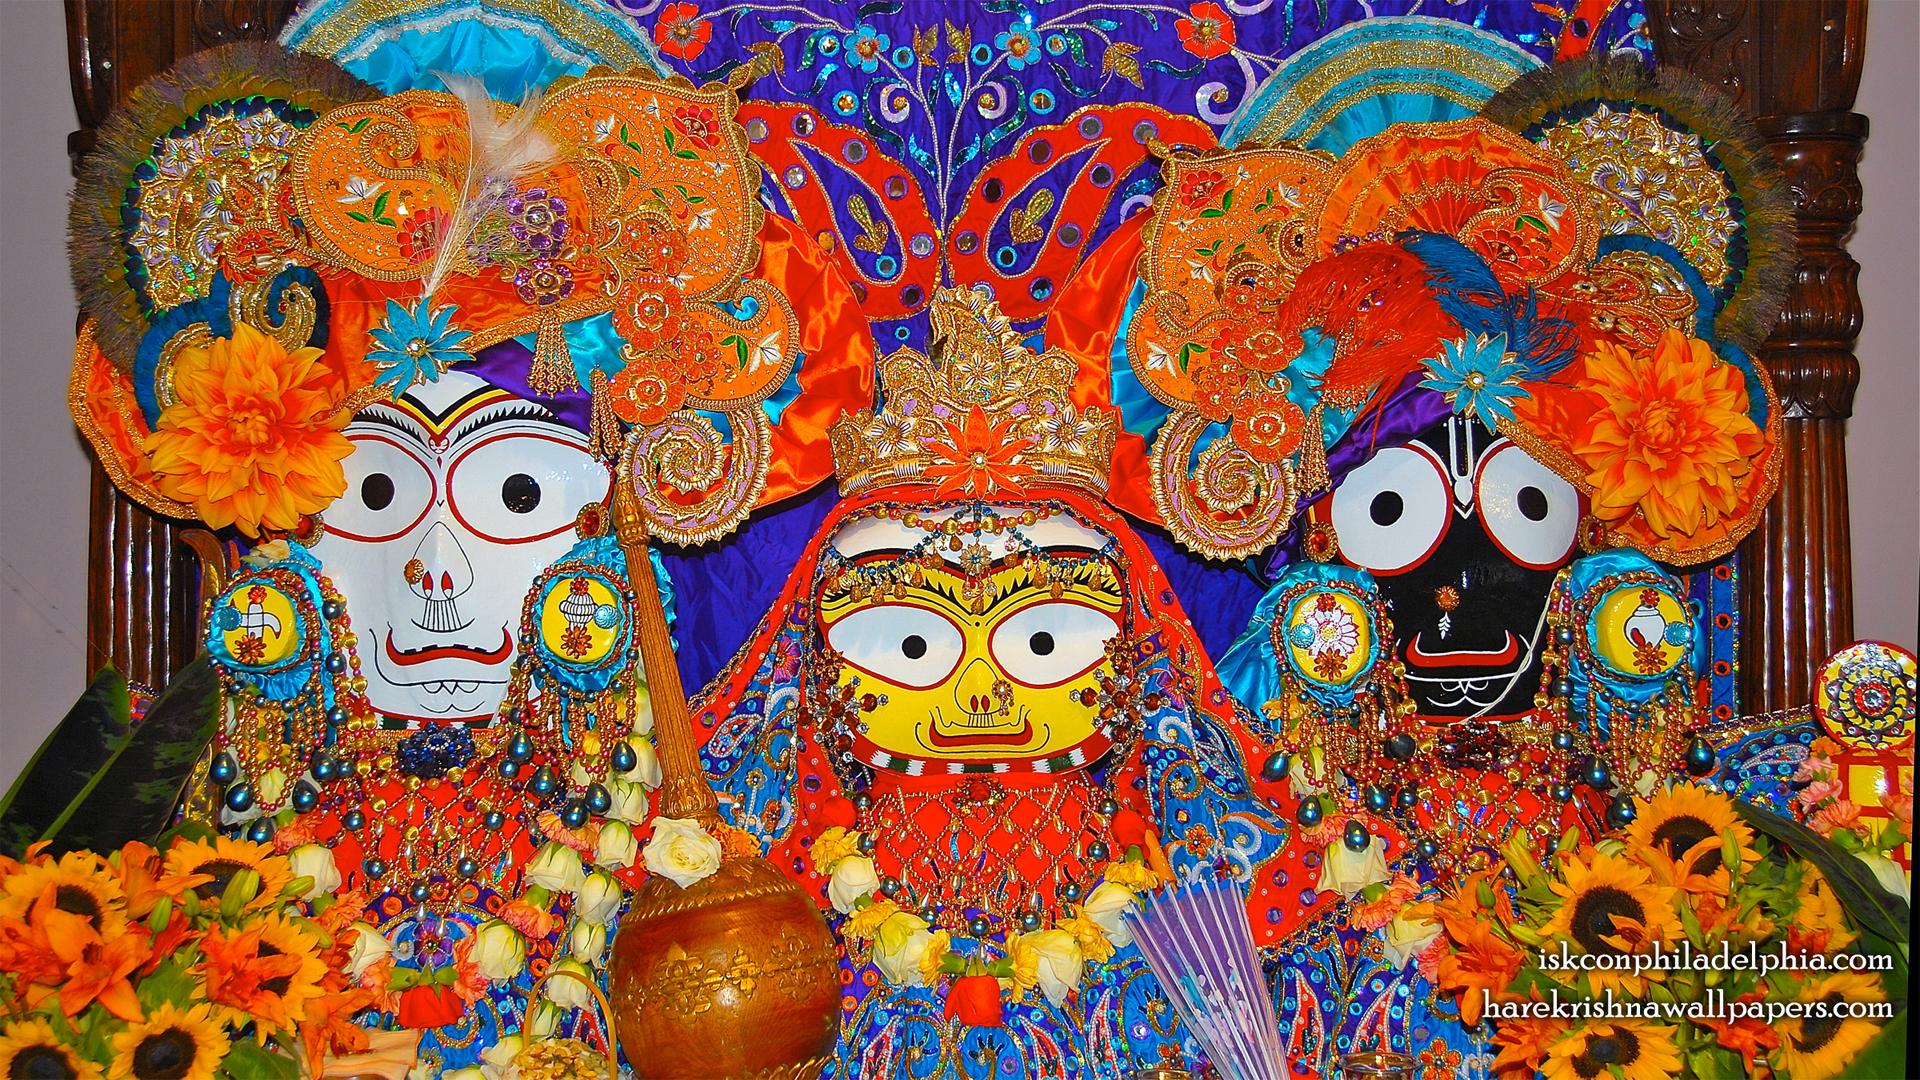 Jagannath Baladeva Subhadra Wallpaper (010) Size 1920x1080 Download